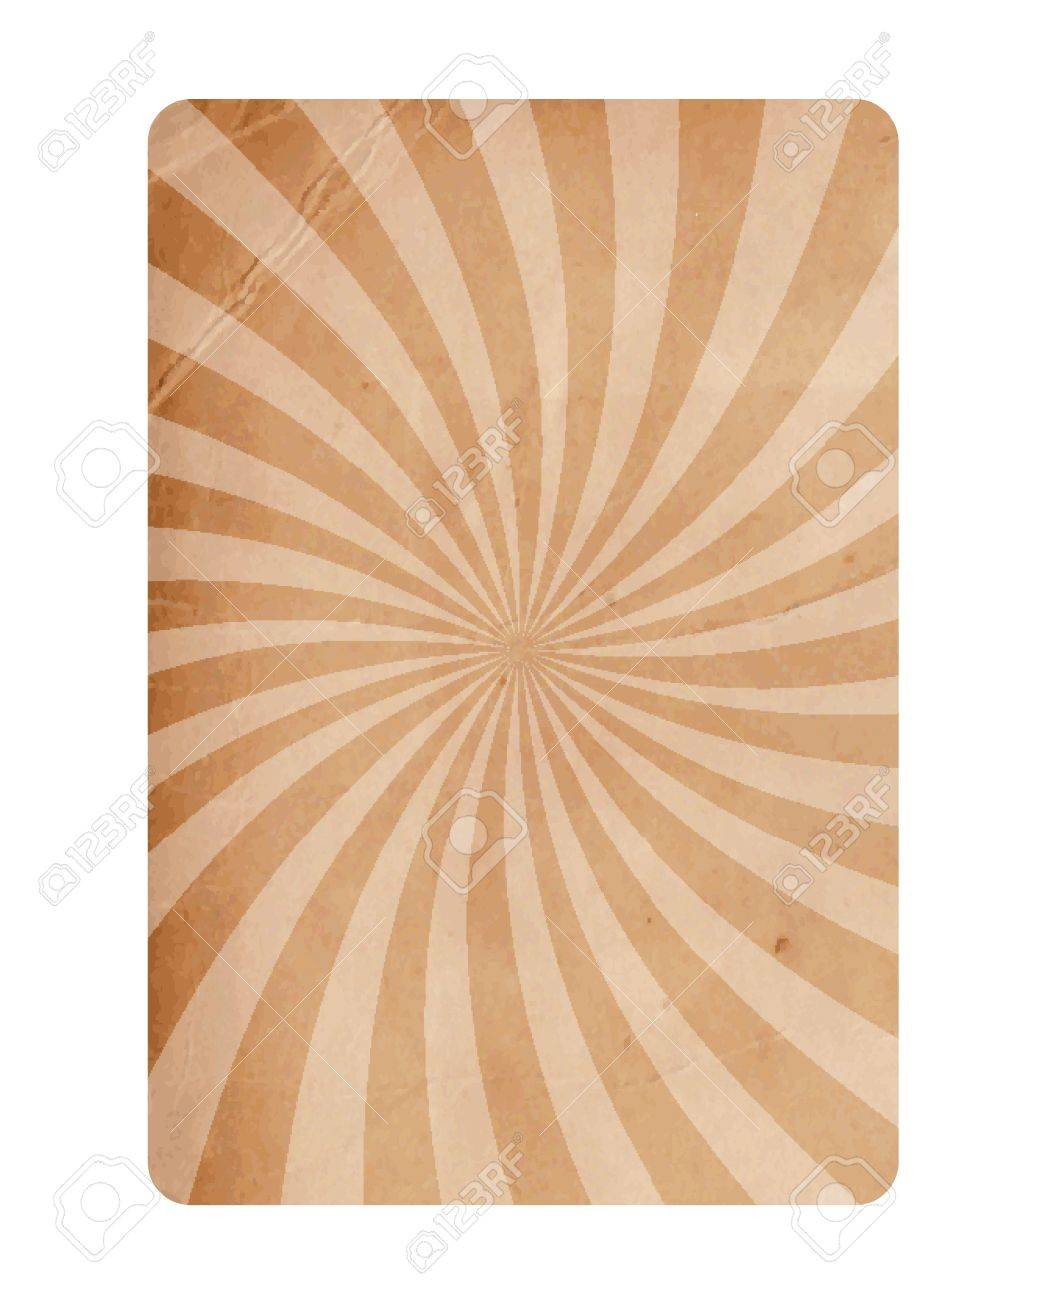 Vintage Spiral Texture Paper Background Vector Stock Vector - 13551209